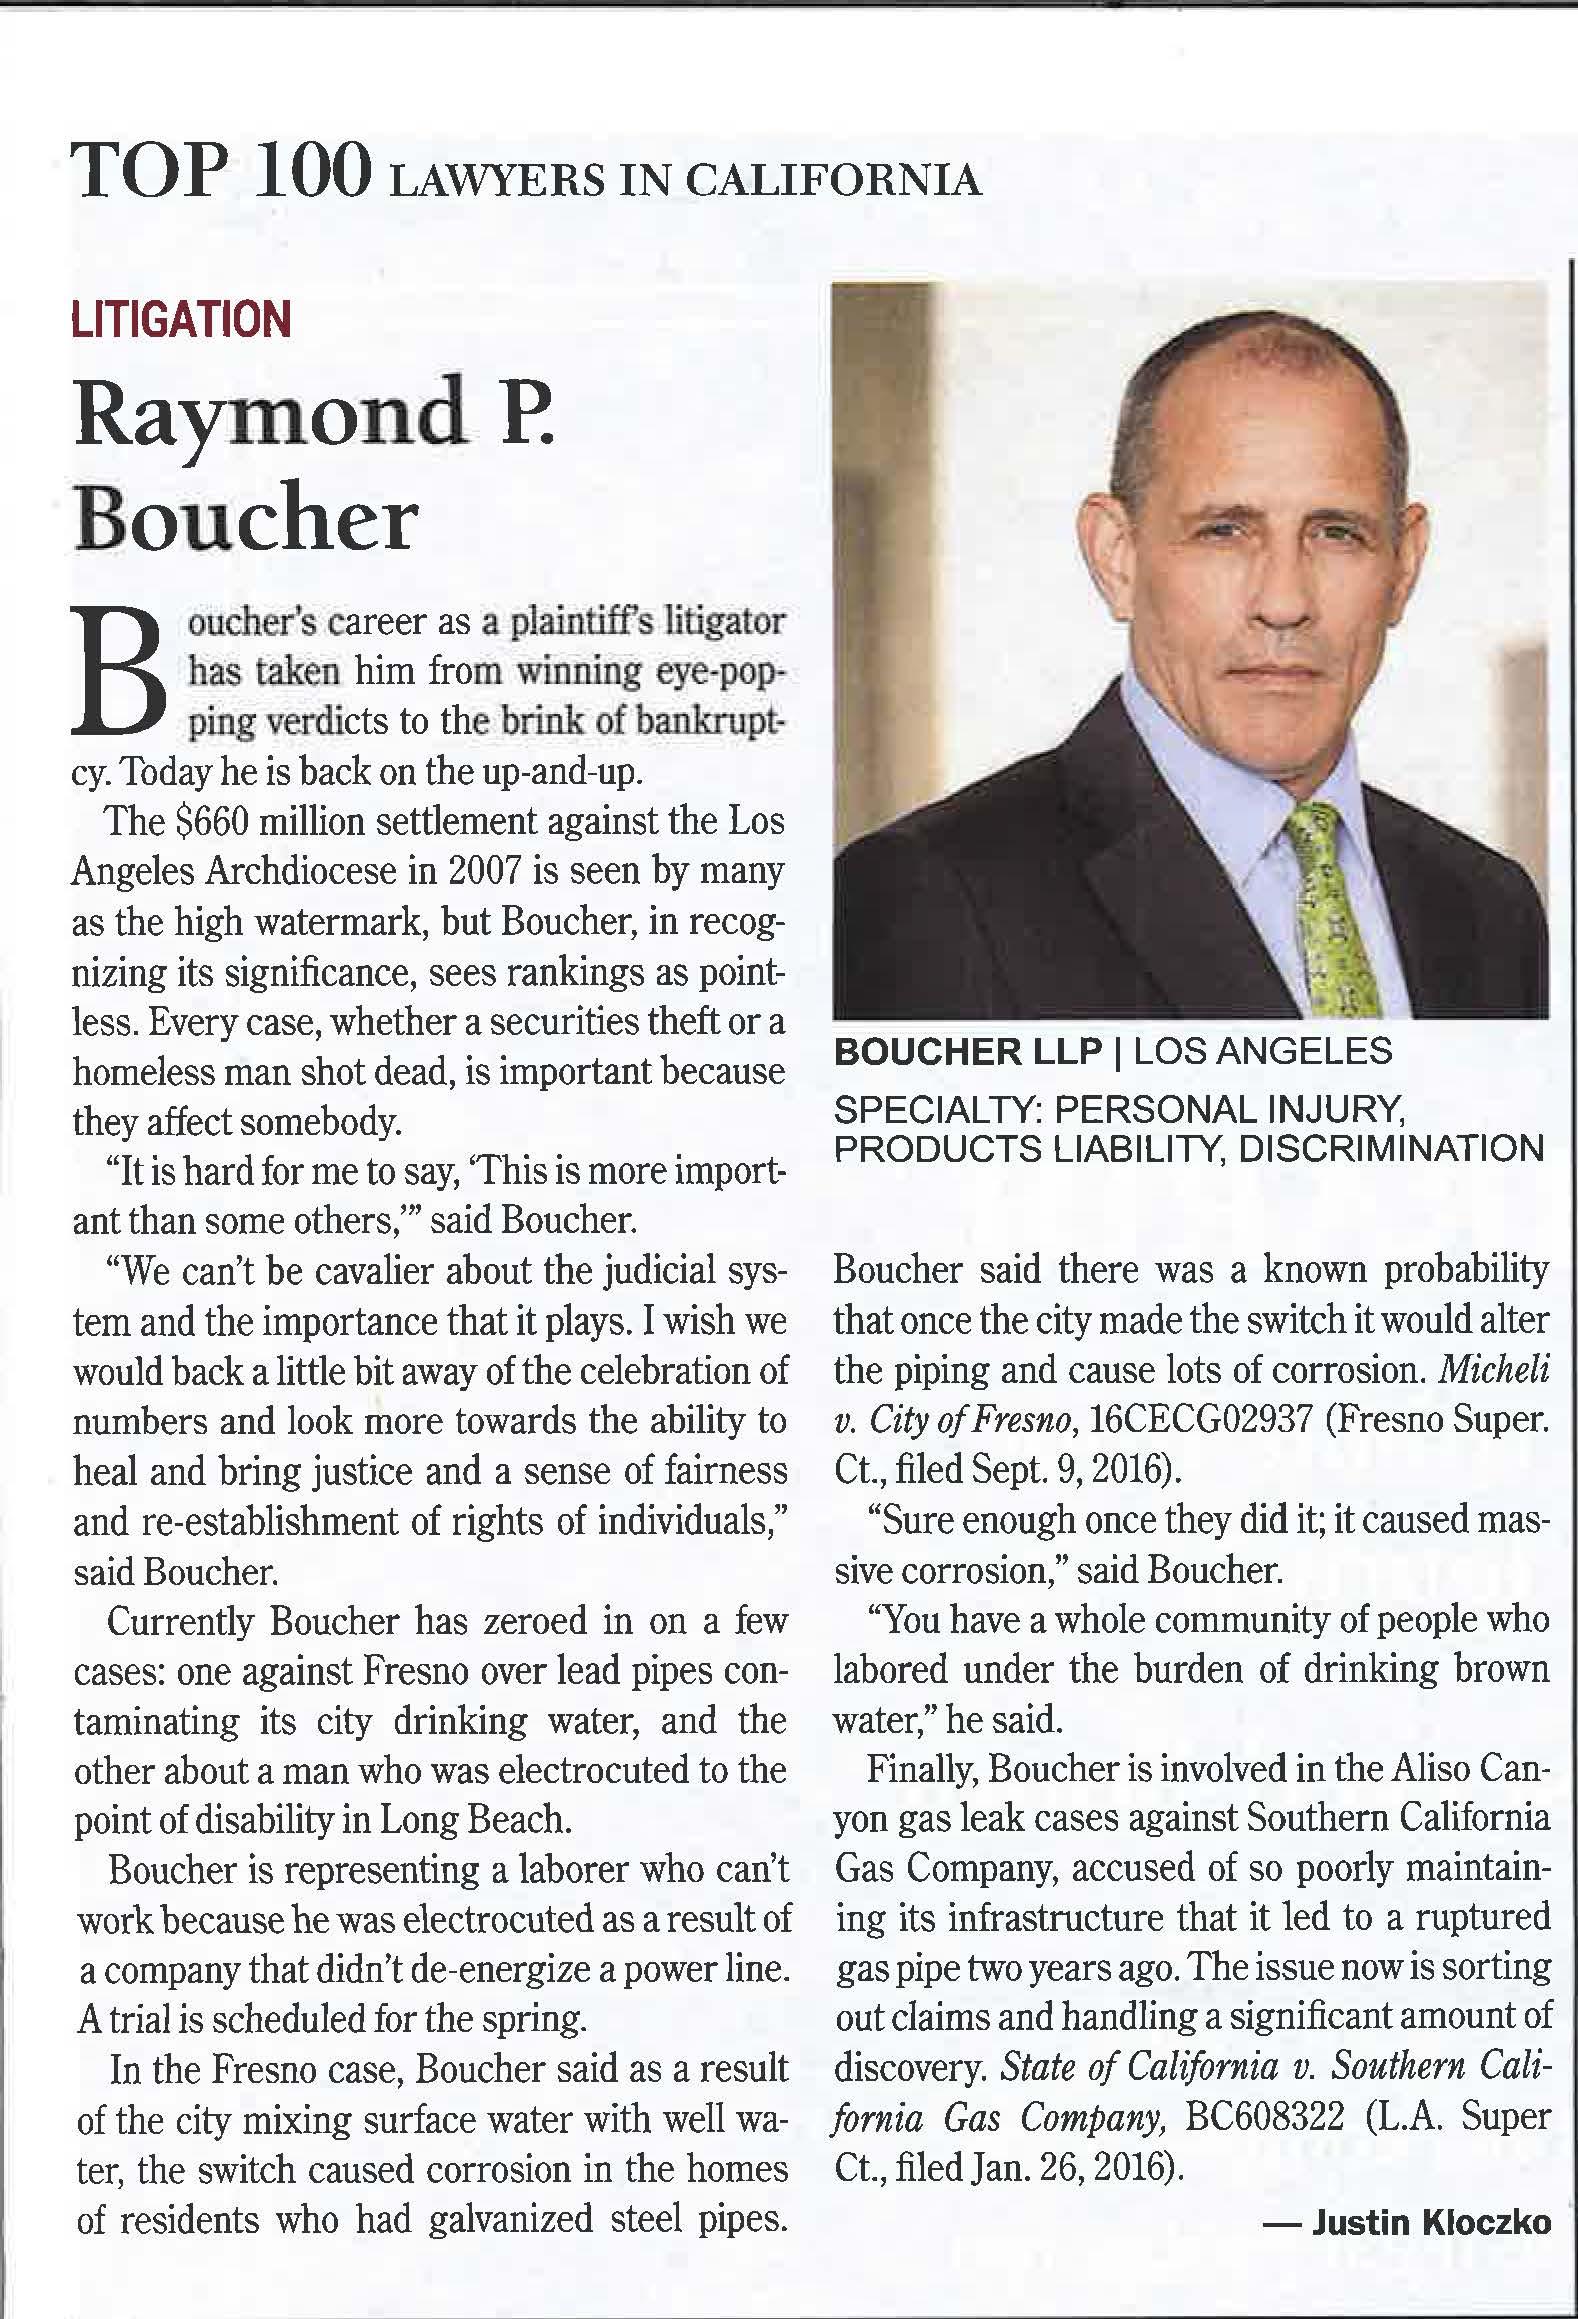 Daily Journal 2018  (Top 100) -- Raymond P. Boucher (00125514xDA81A).JPG